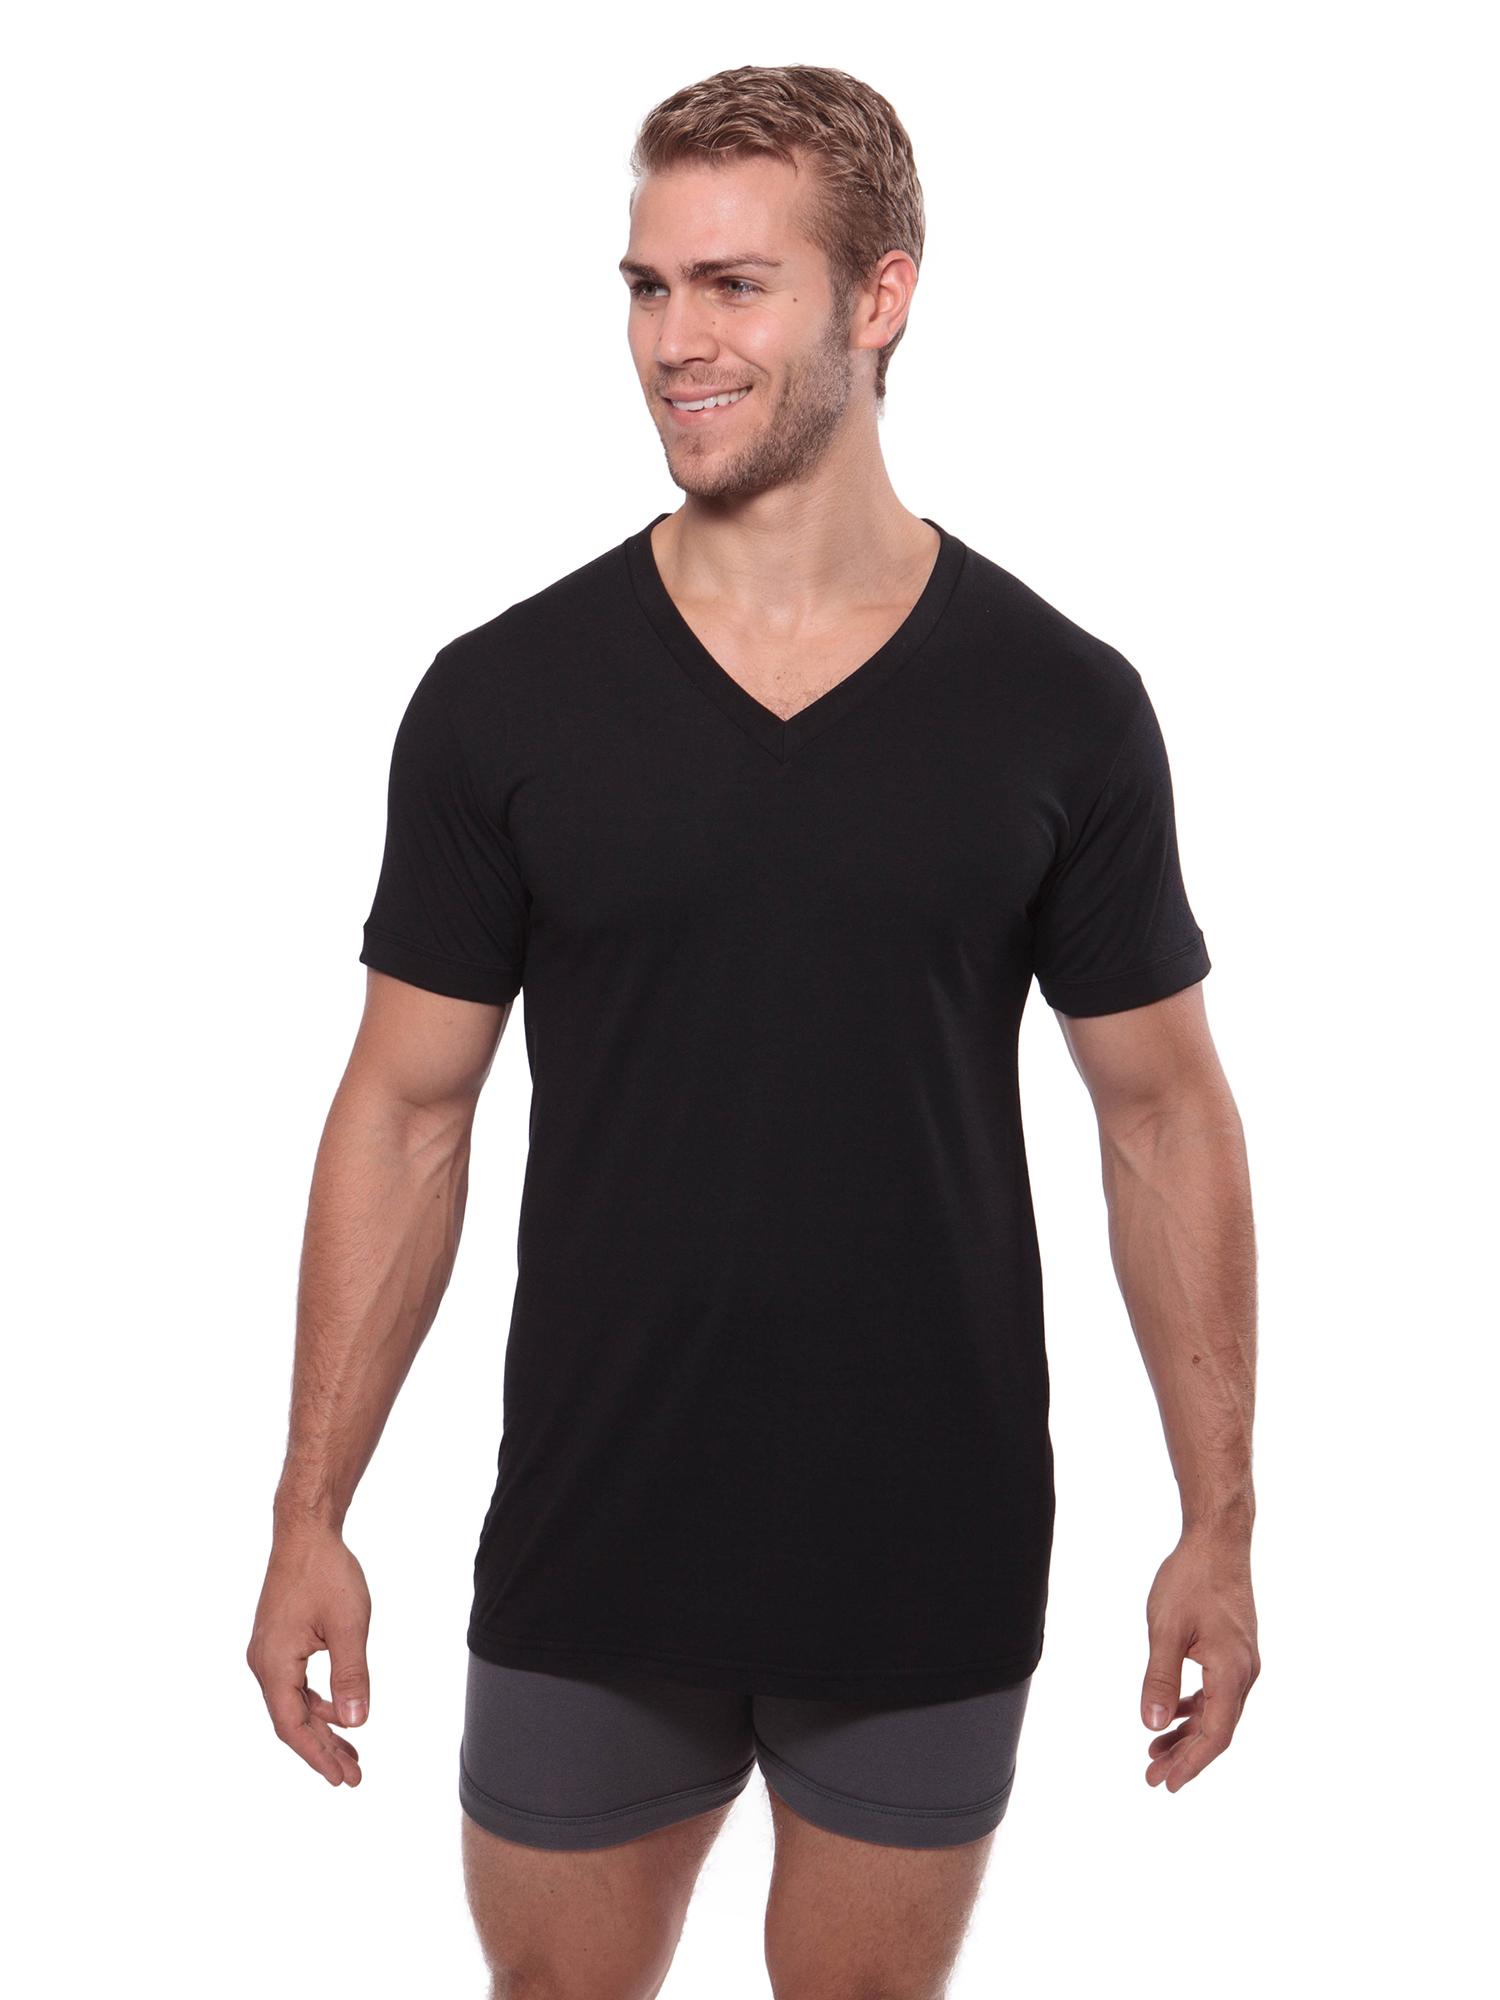 Meio, Black, LT Comfortable Shirt Texere Mens V-Neck 2 Pack Undershirt